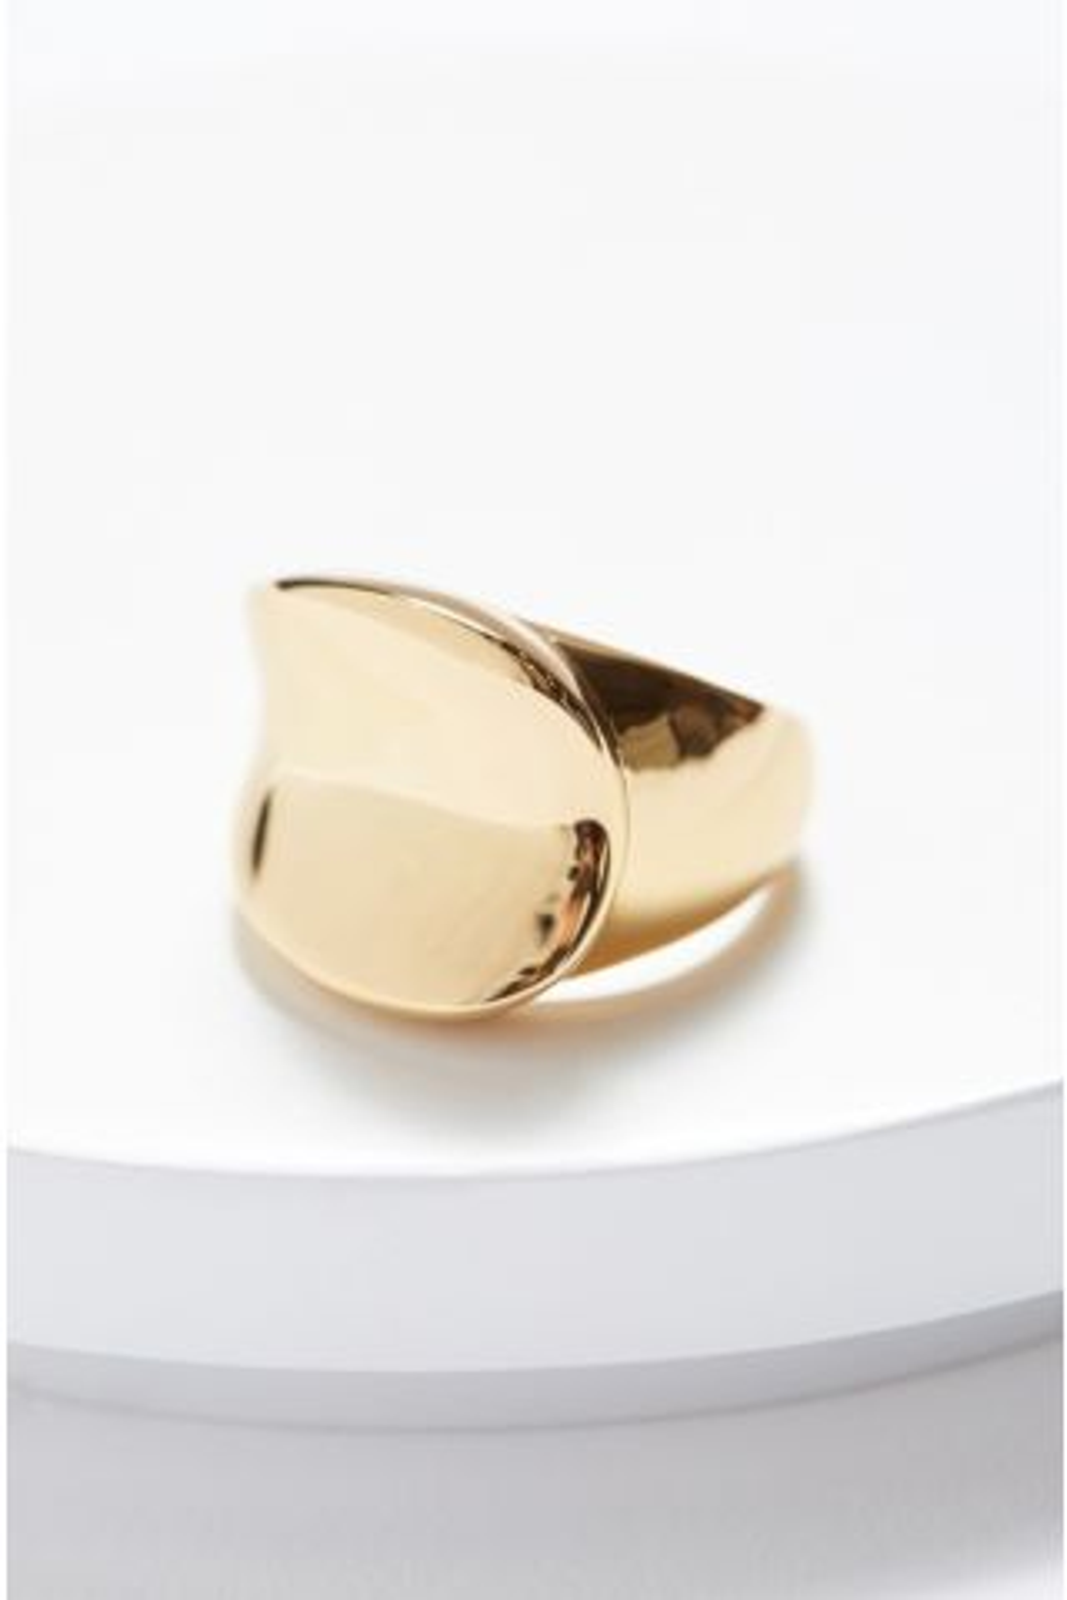 Lainey Ring